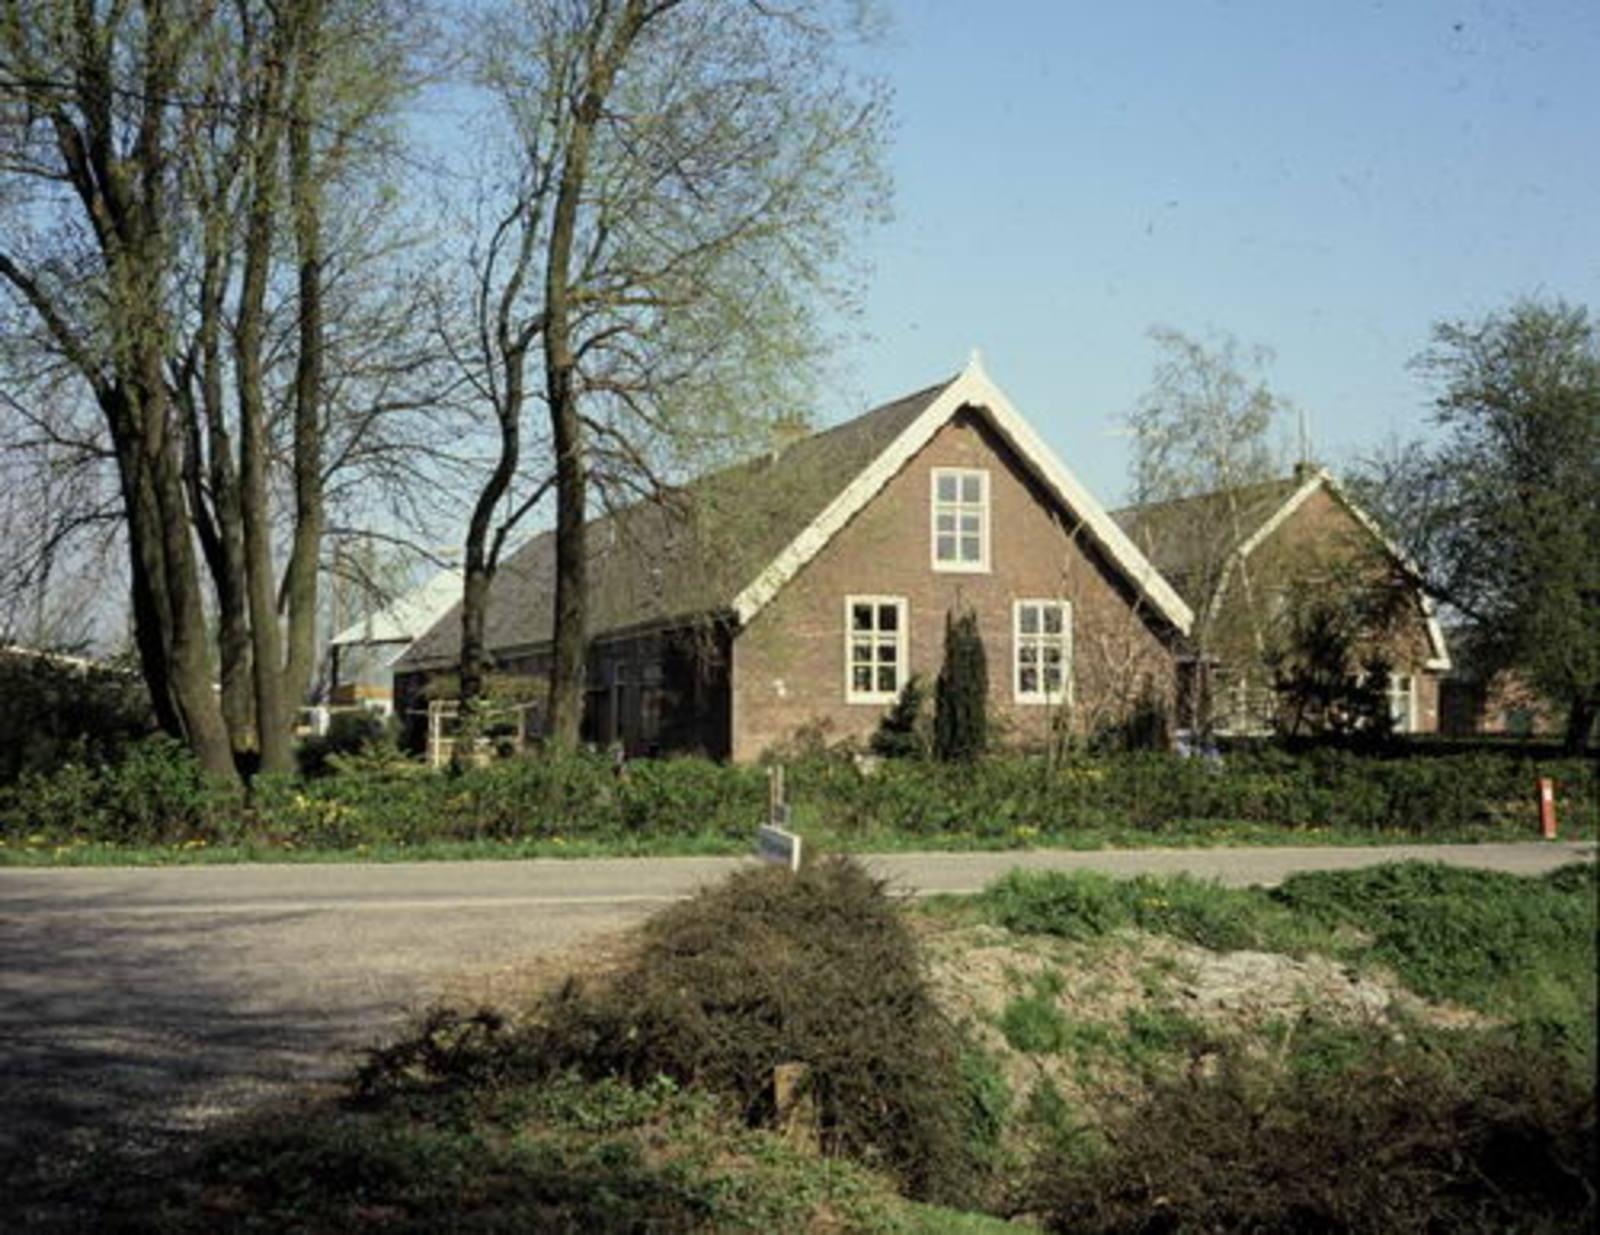 Sloterweg W 0345-349 1984 Wilhelmina Cornelia hoeve